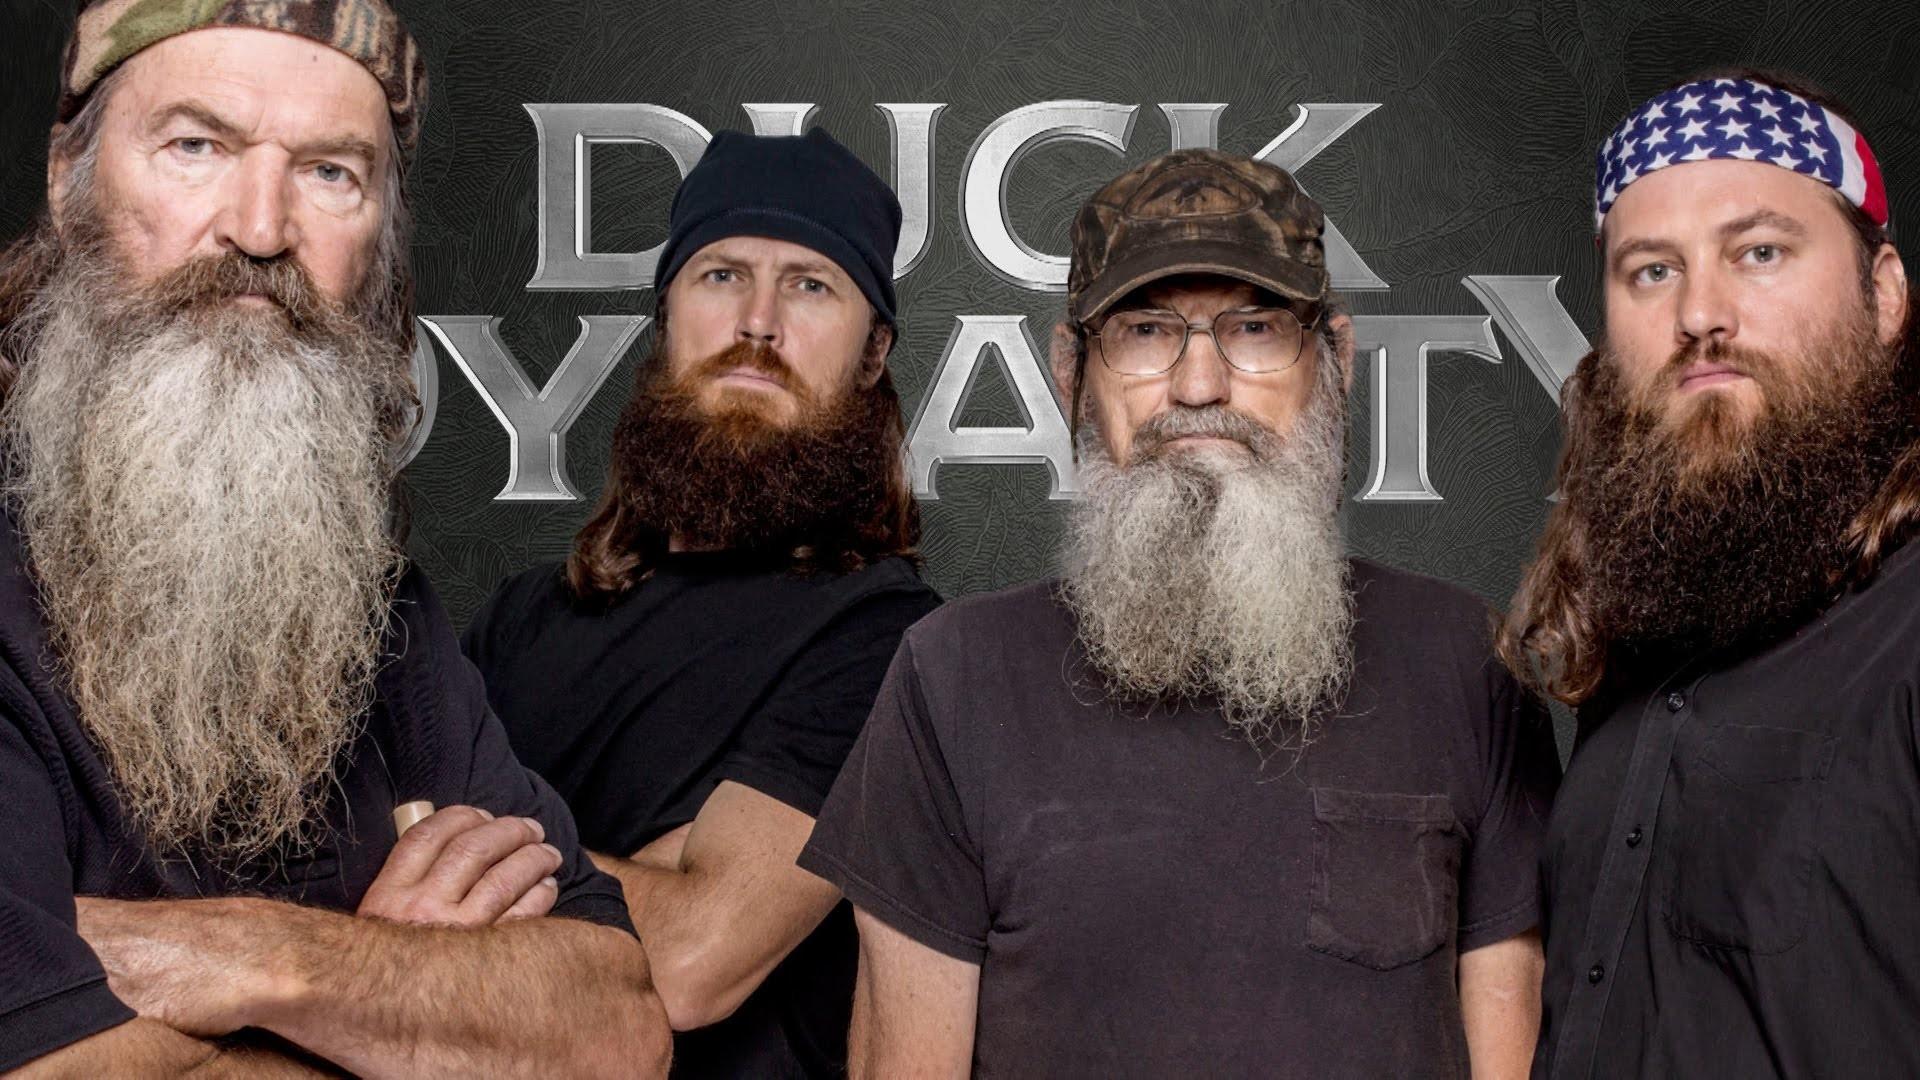 A&E – Duck Dynasty Season 9